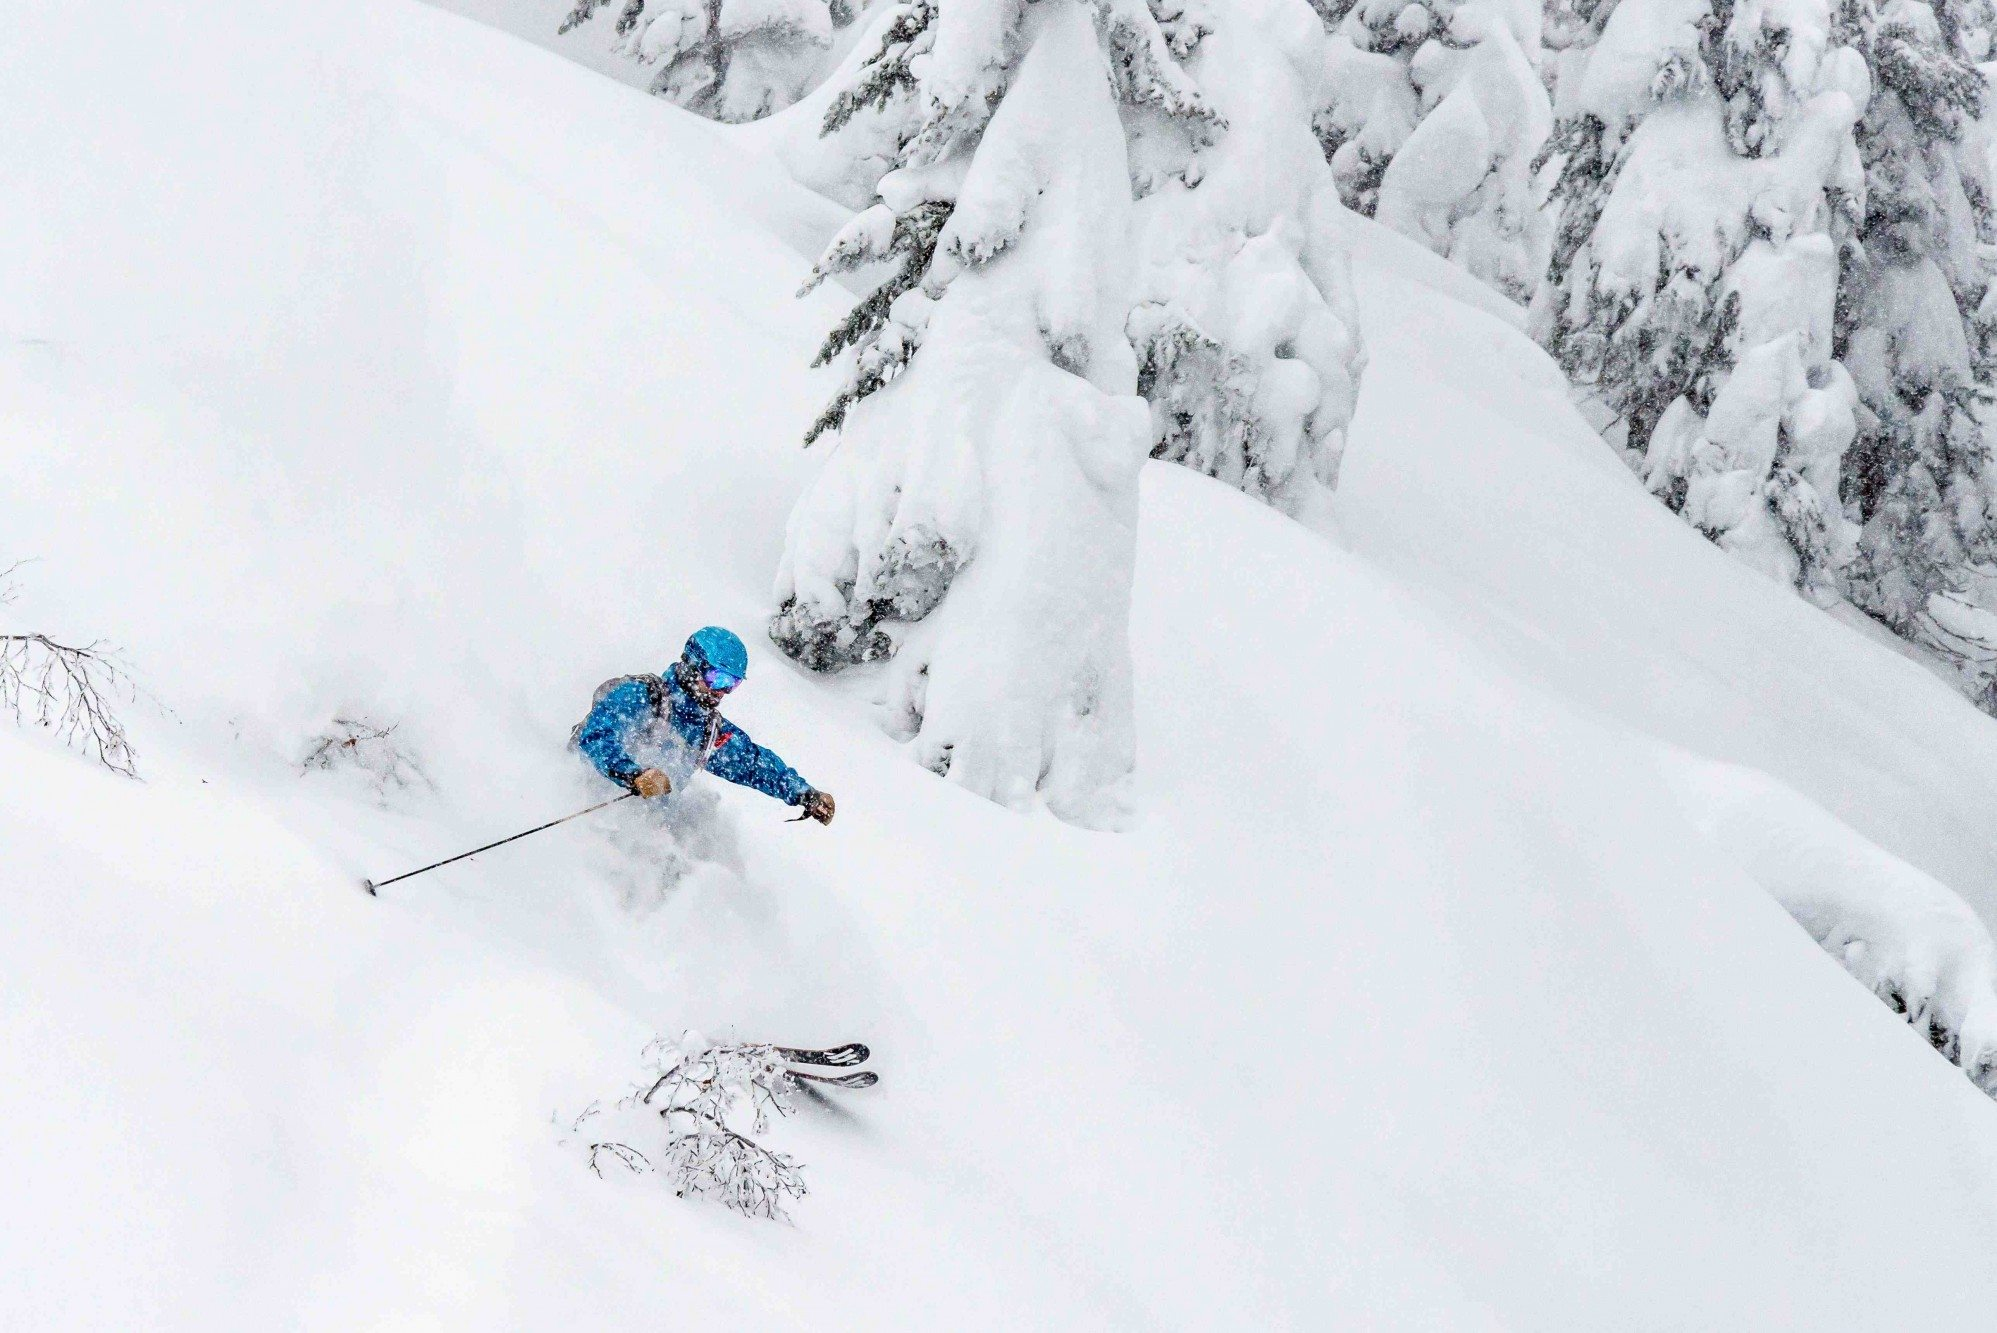 dave skiing near revelstoke Photo Ian Stotesbury